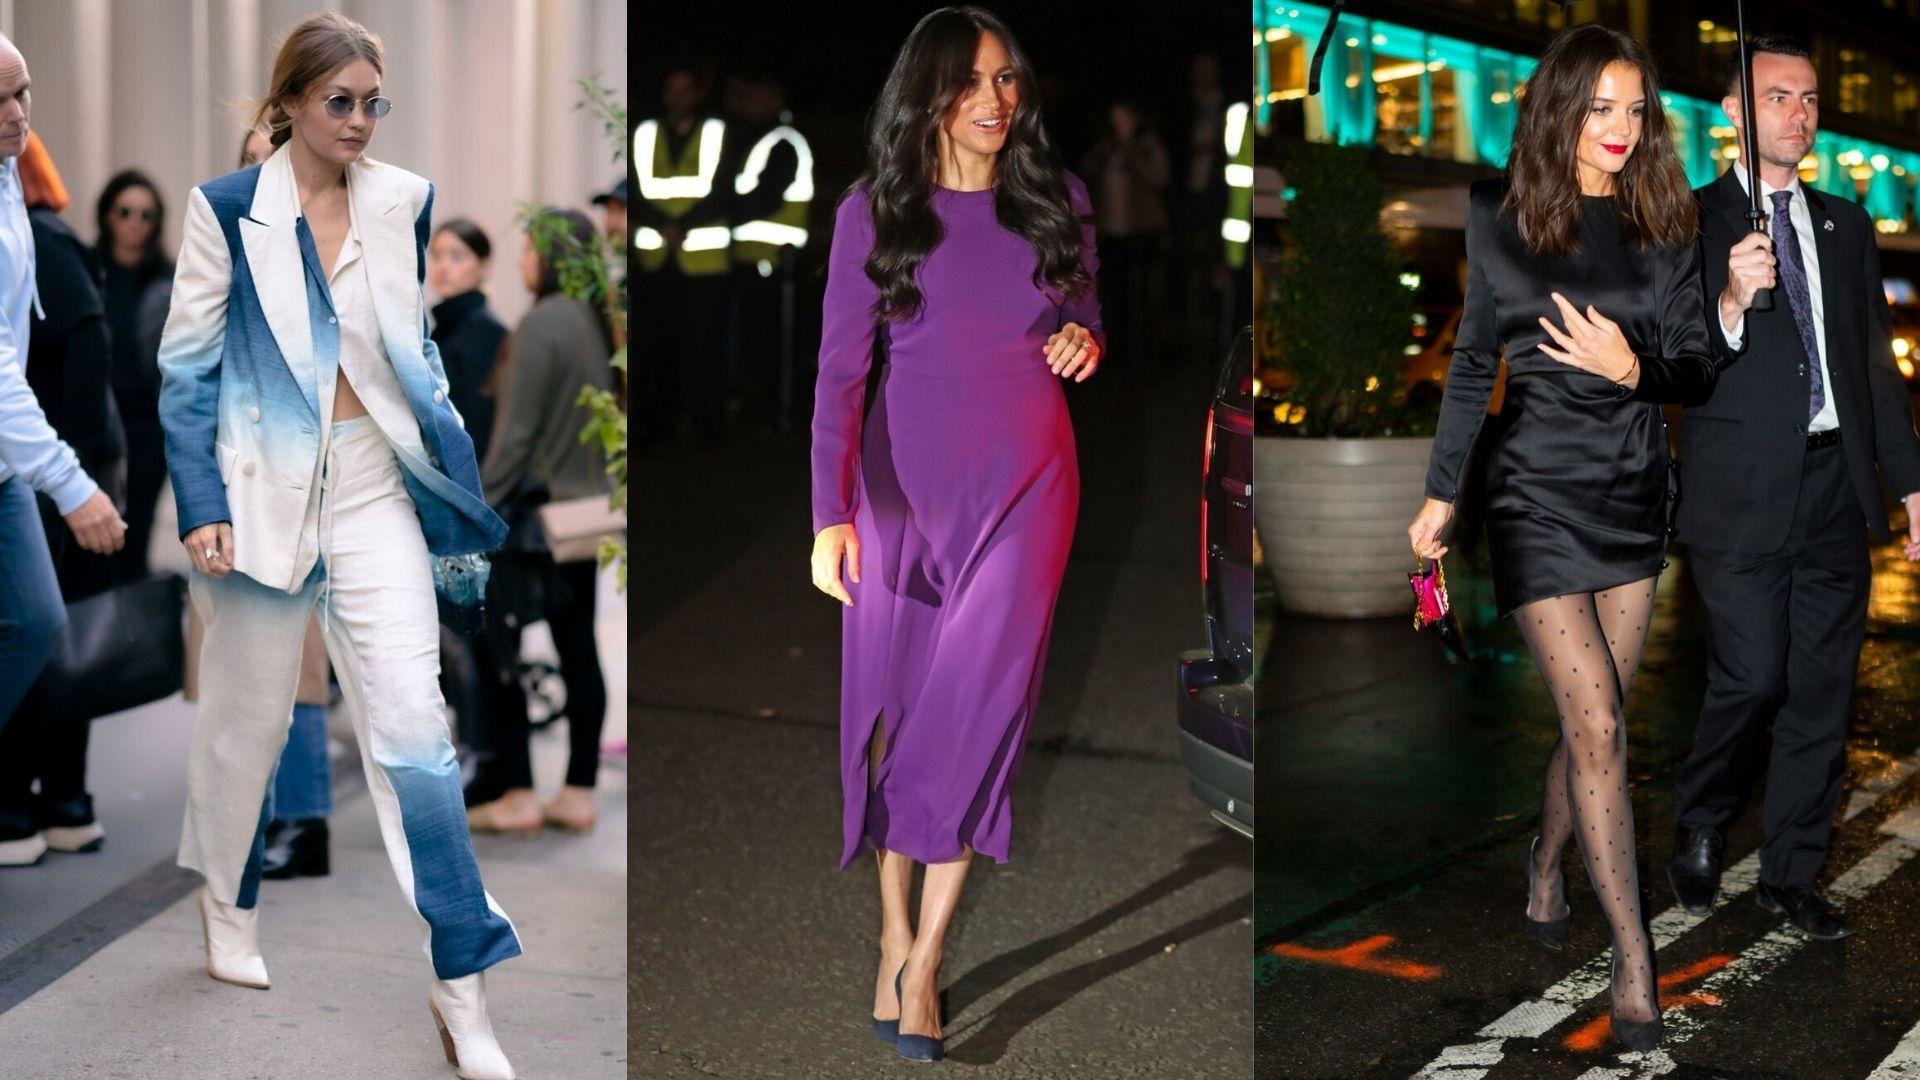 The Best Dressed Celebrities Of The Week: 21 October